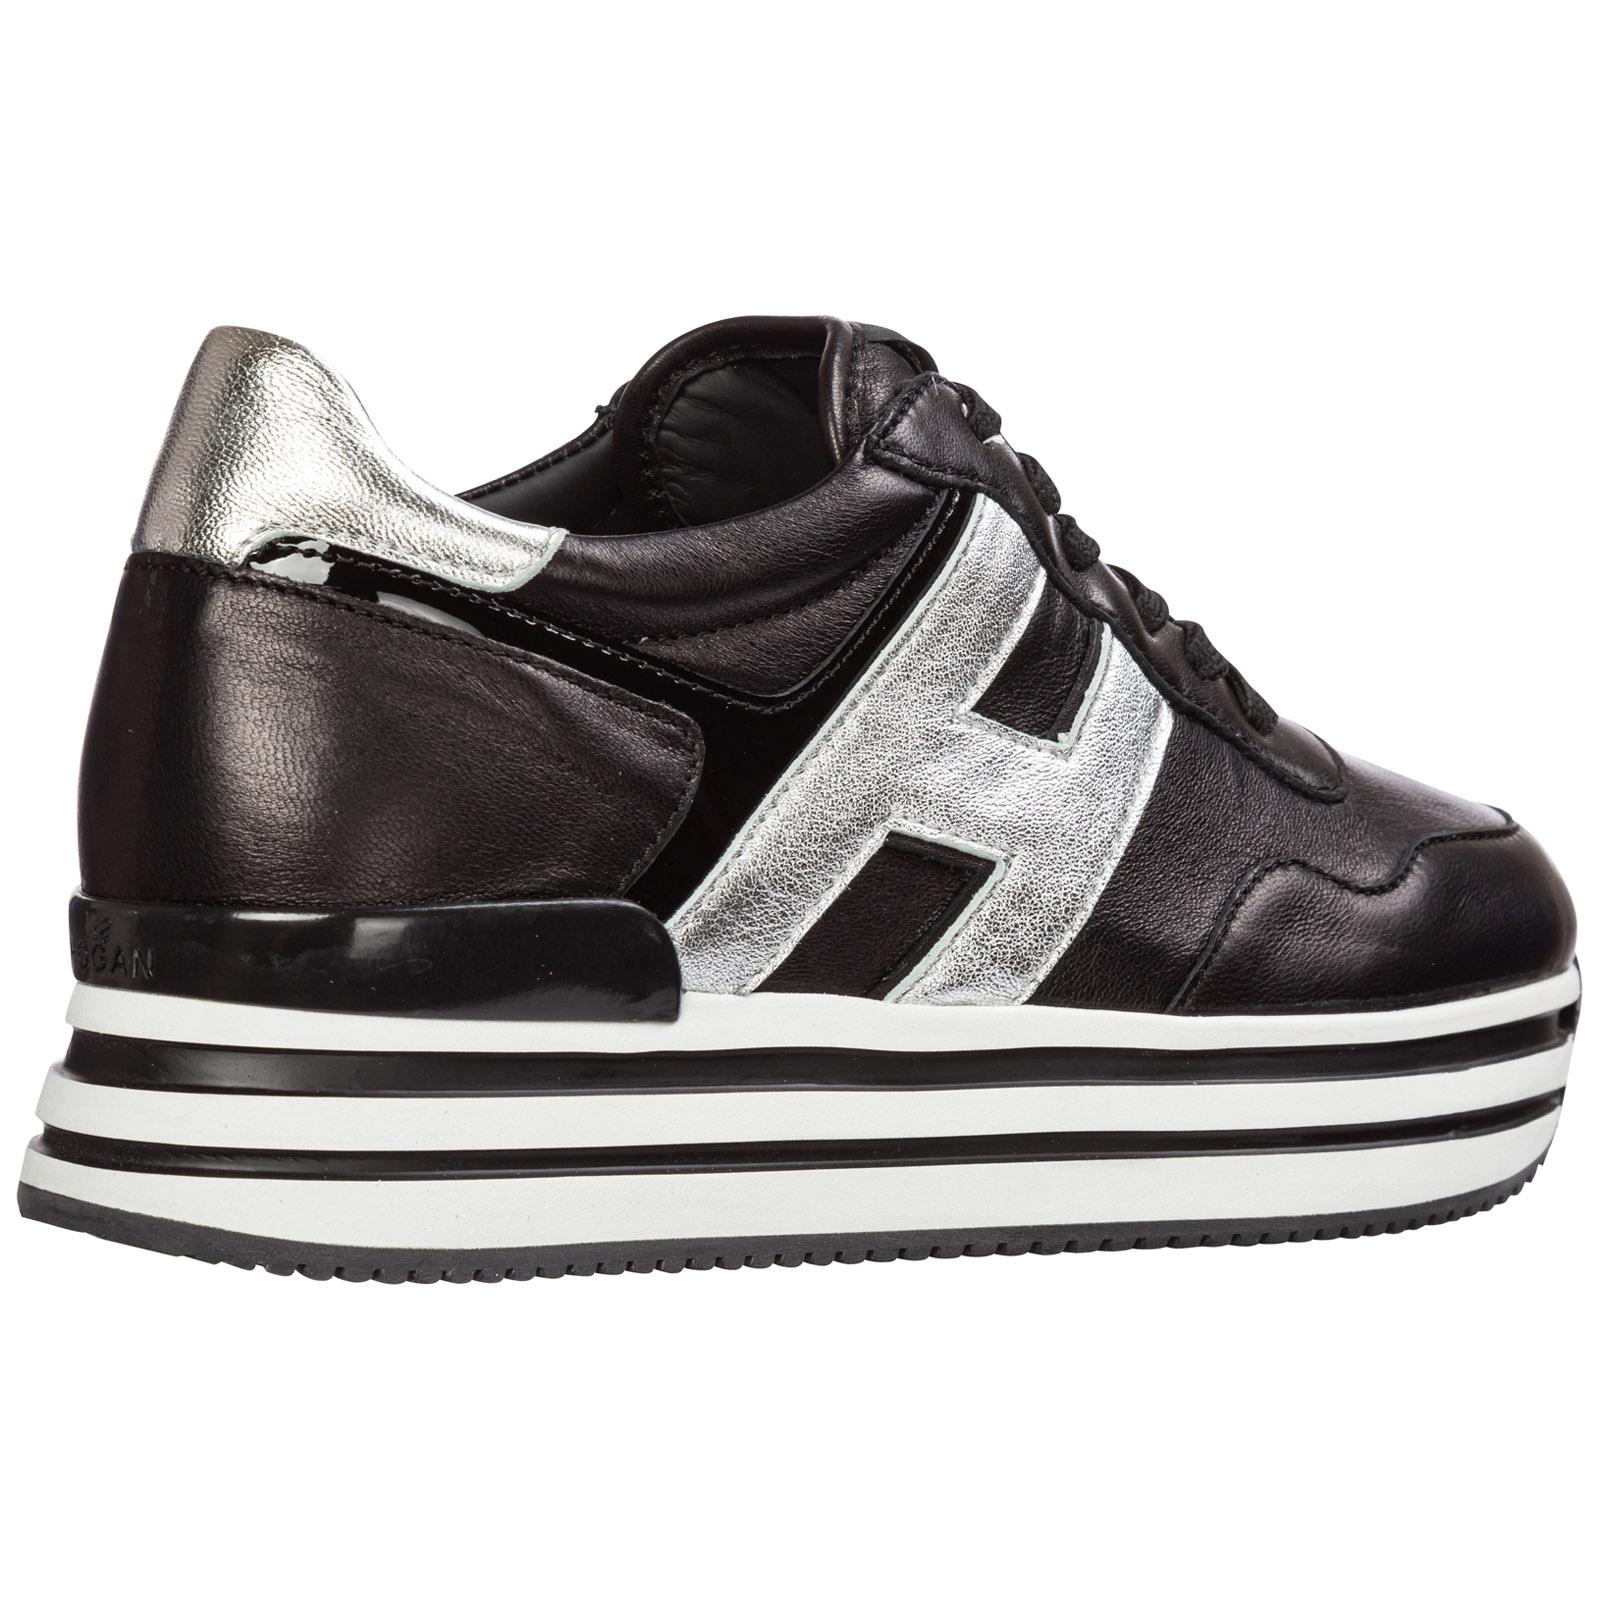 Scarpe sneakers donna in pelle midi platform